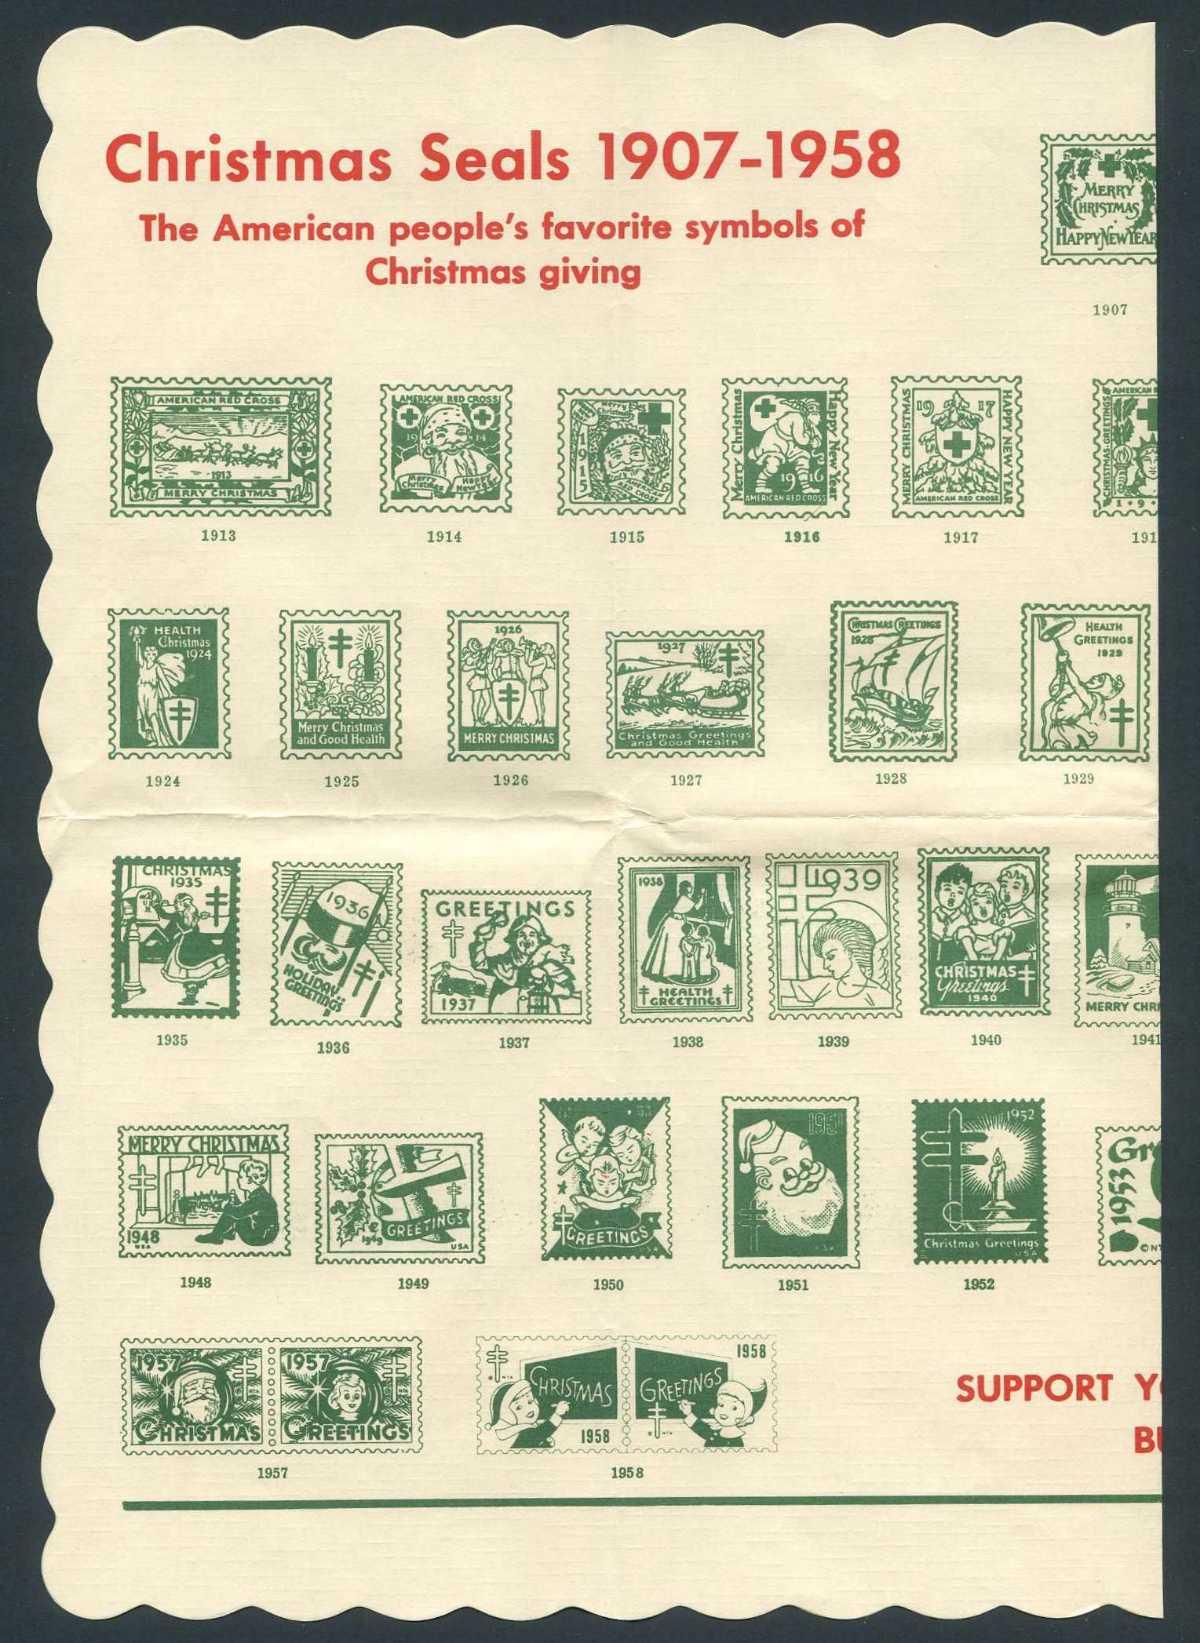 US Christmas Seals Album Pages - Stamp Community Forum